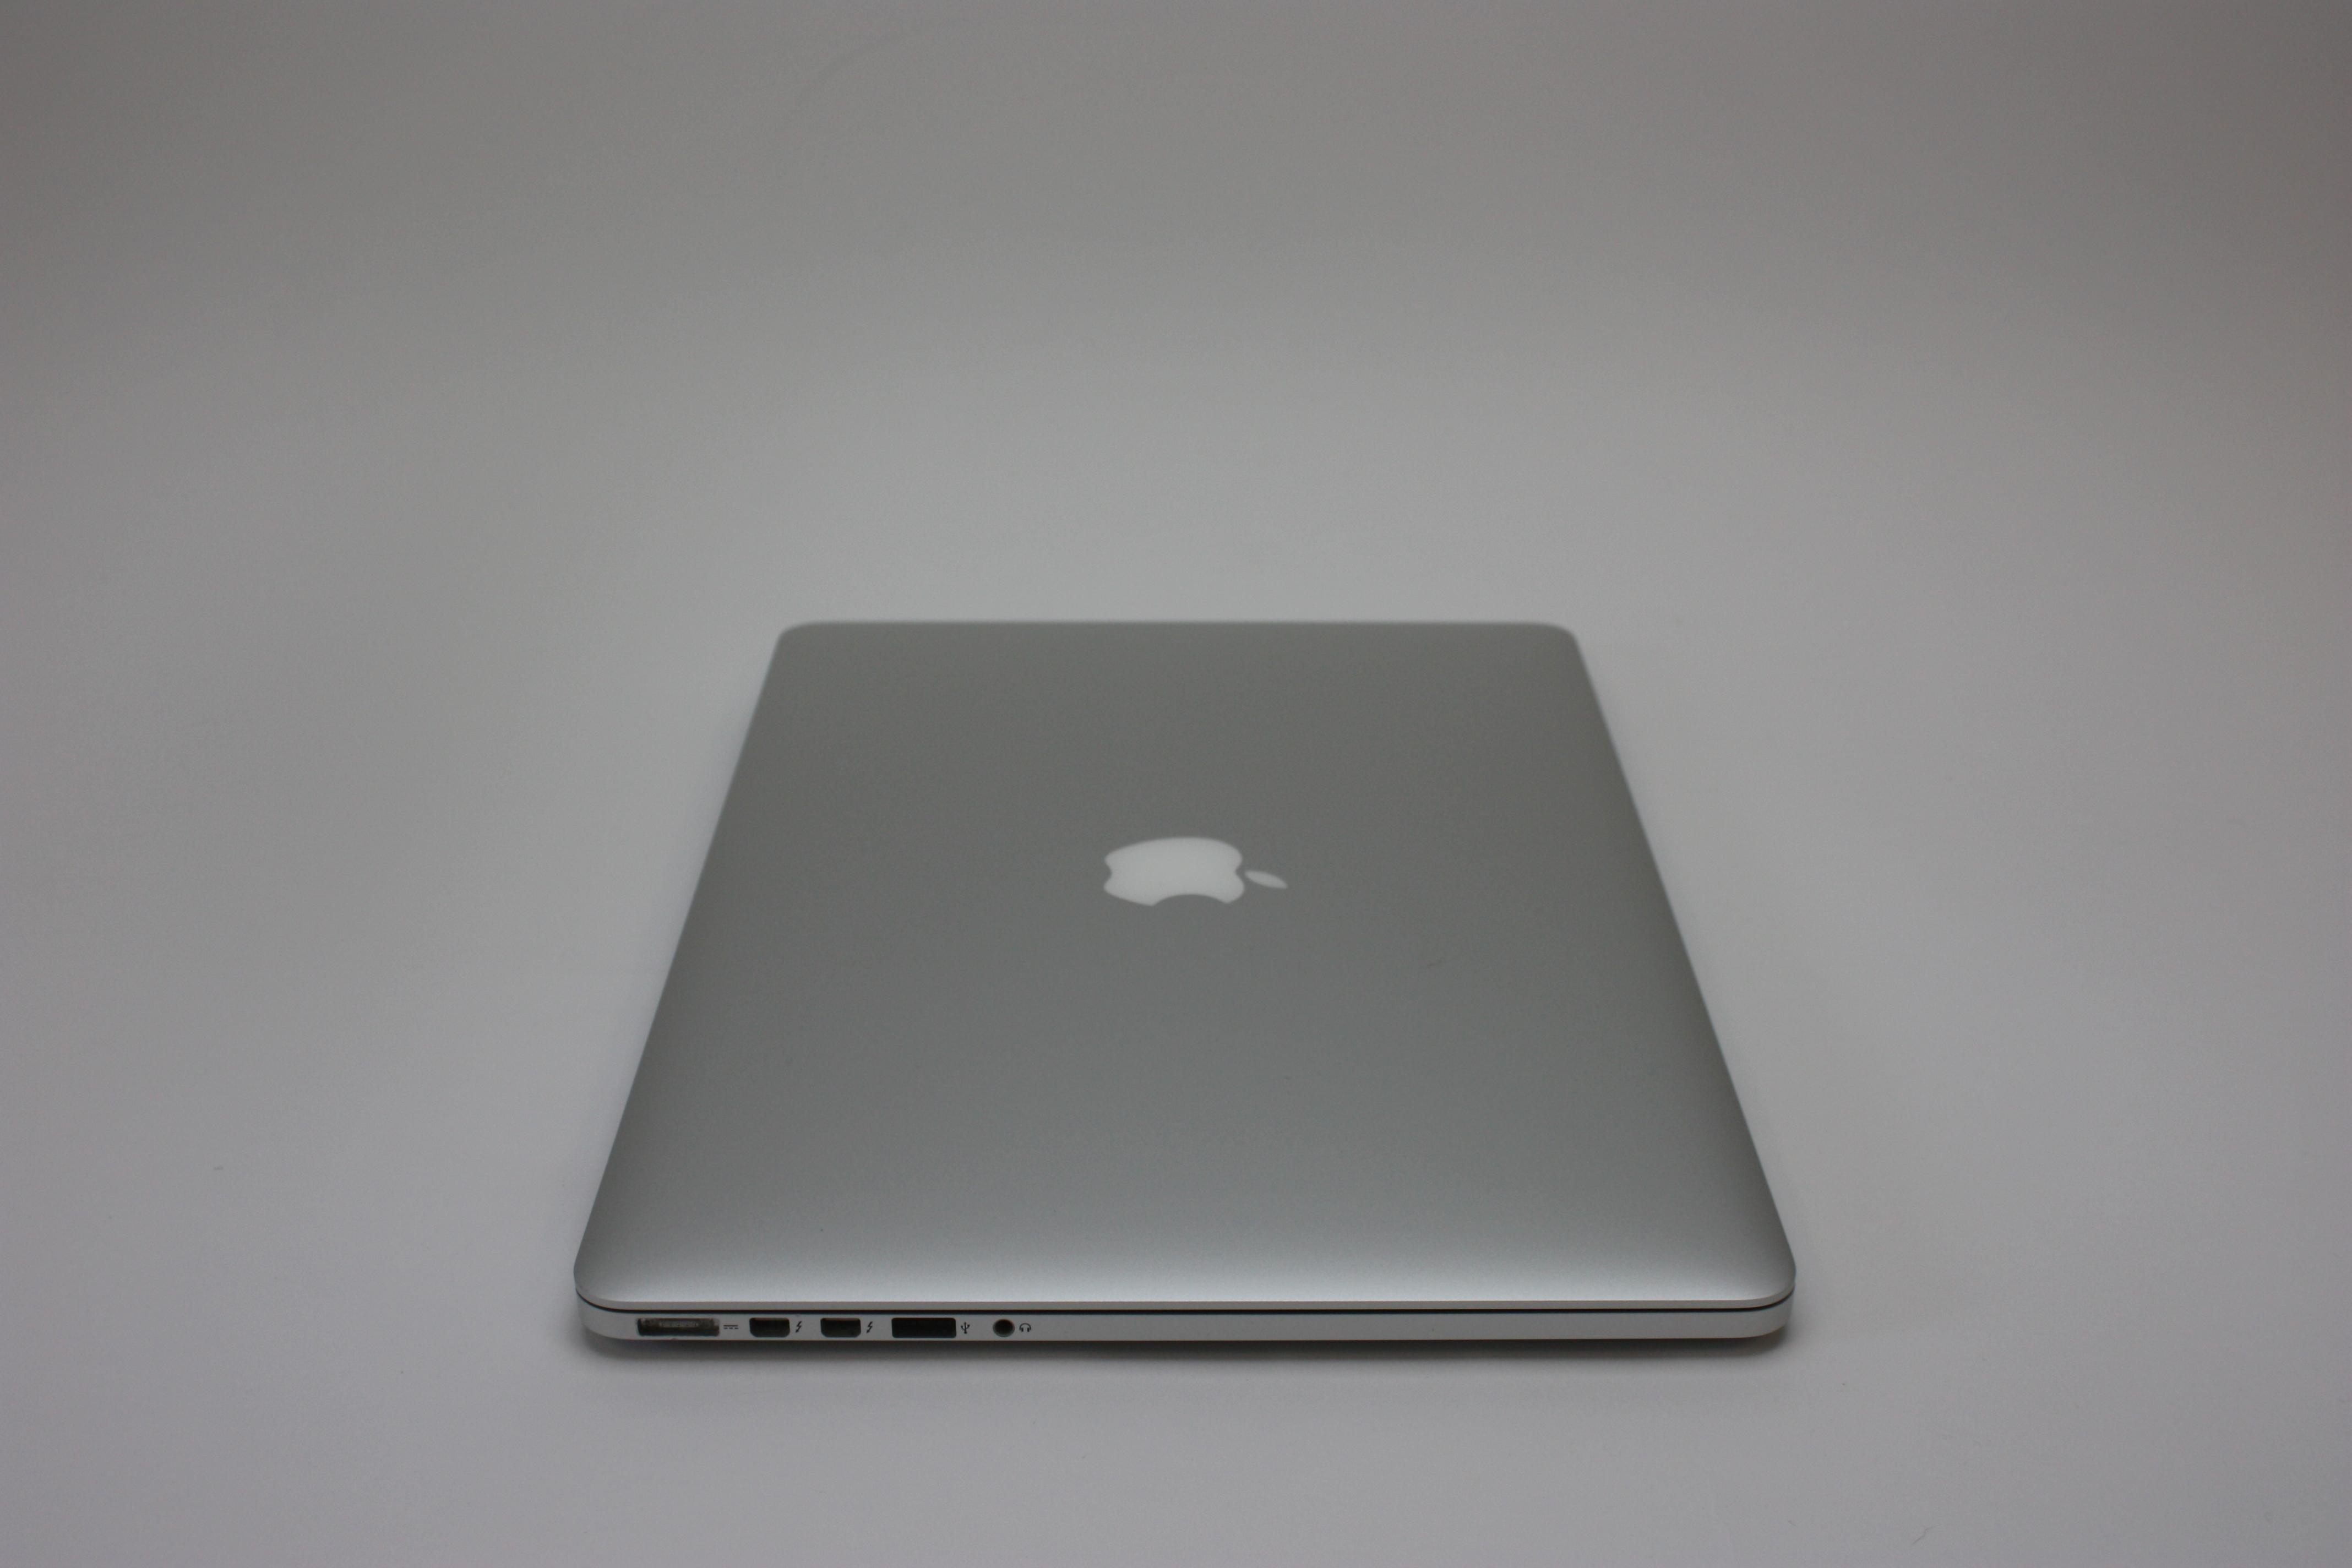 MacBook Pro 15-inch Retina, 2.2 GHz Intel Core i7, 16 GB 1600 MHz DDR3, 256 GB Flash Storage, image 5